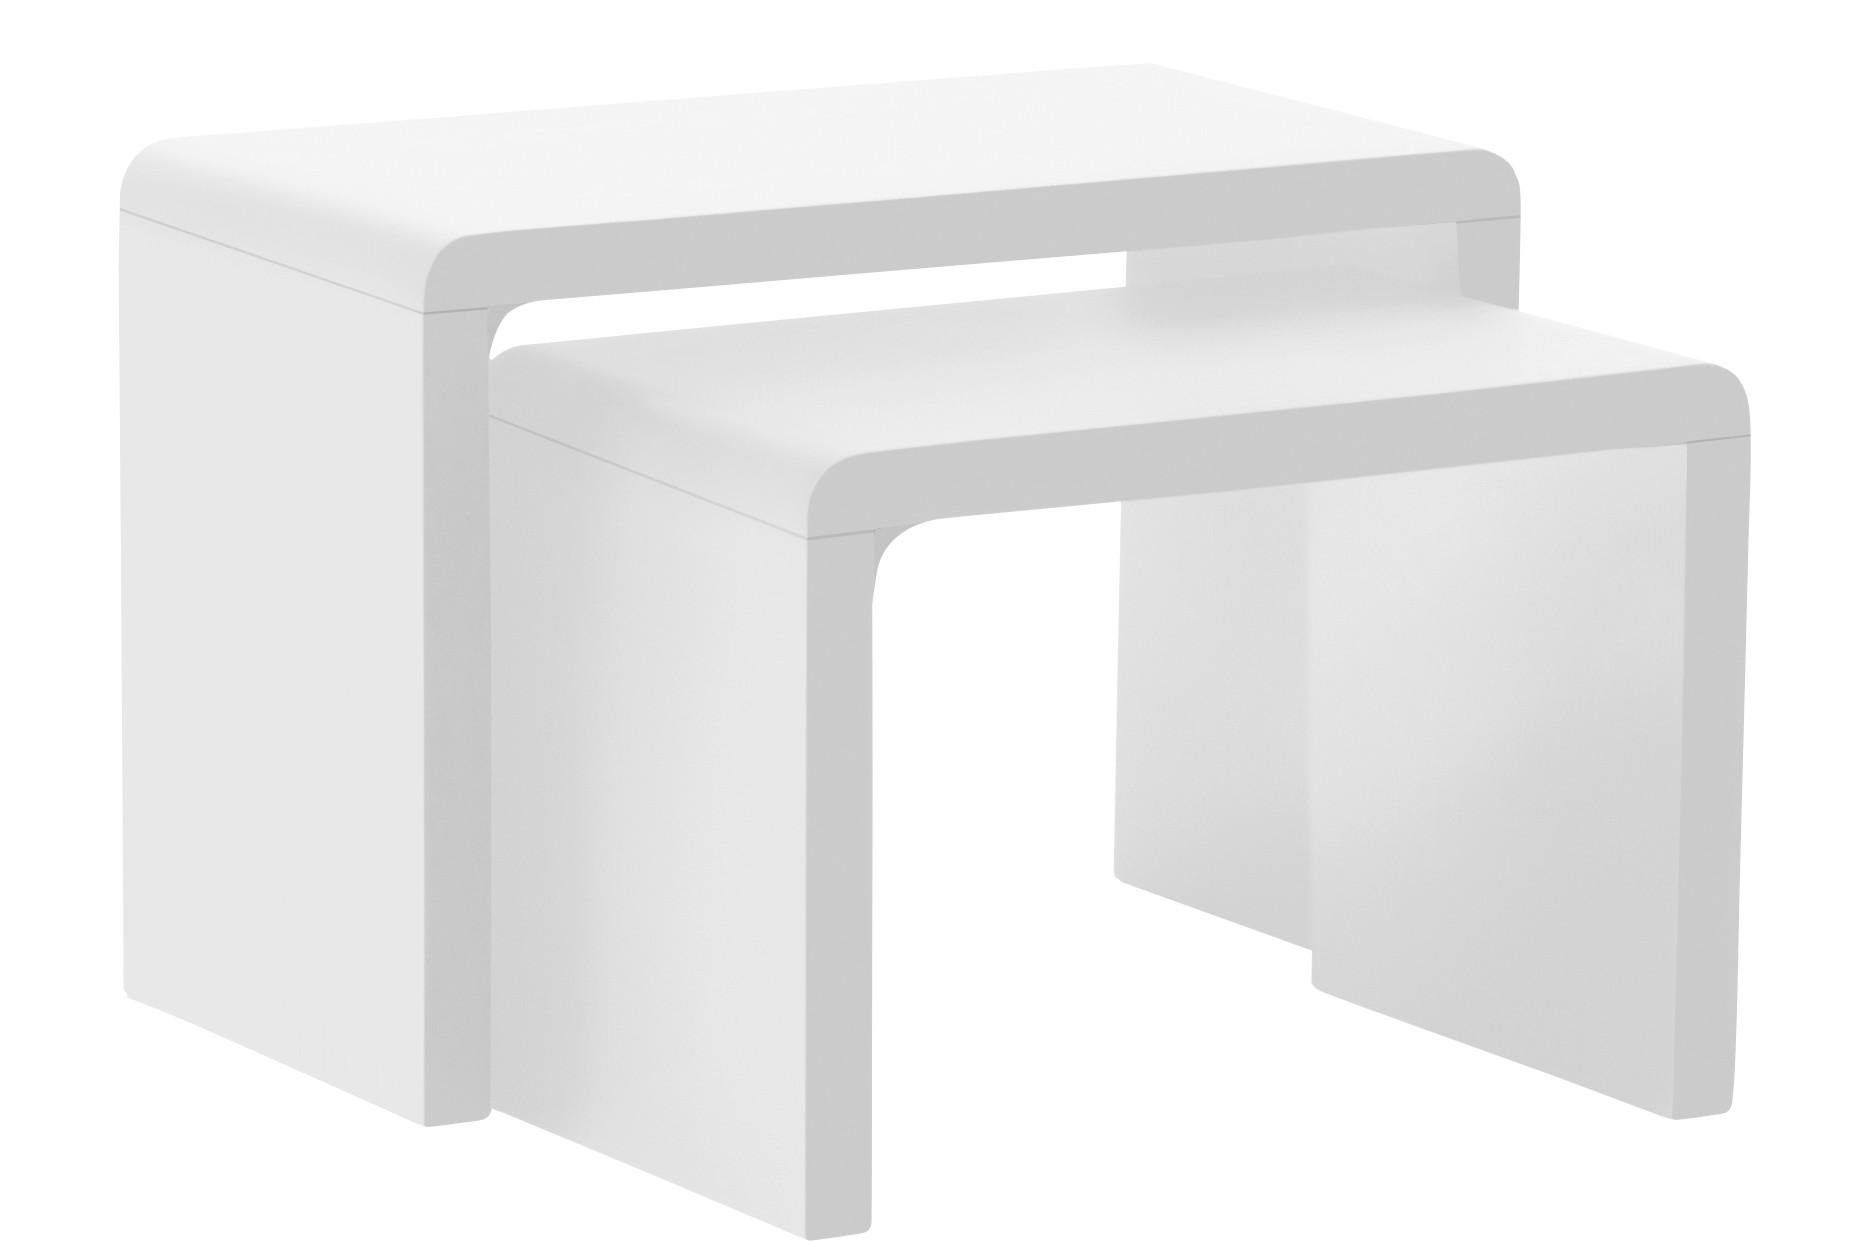 Salontafel nodig?   puur design & interieur helpt je op weg!